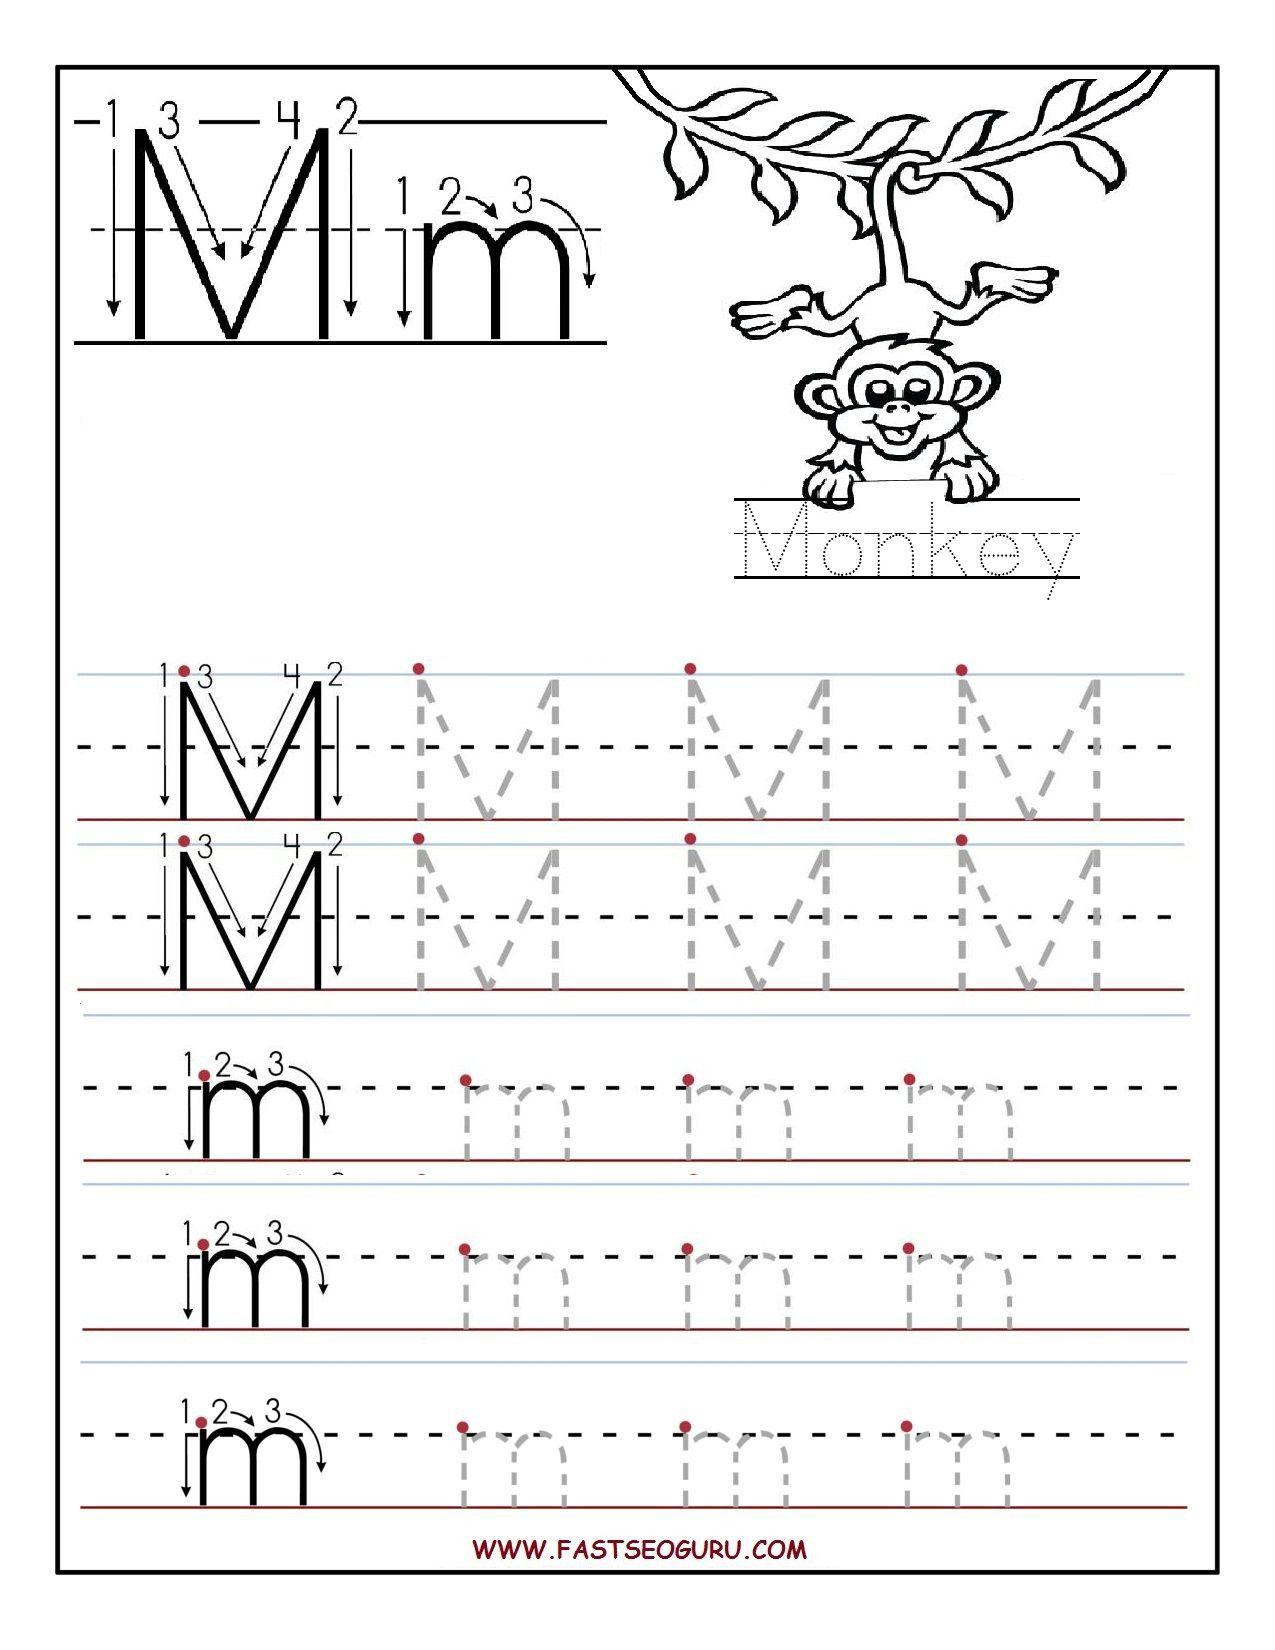 5 Printable Preschool Worksheets Letter V In